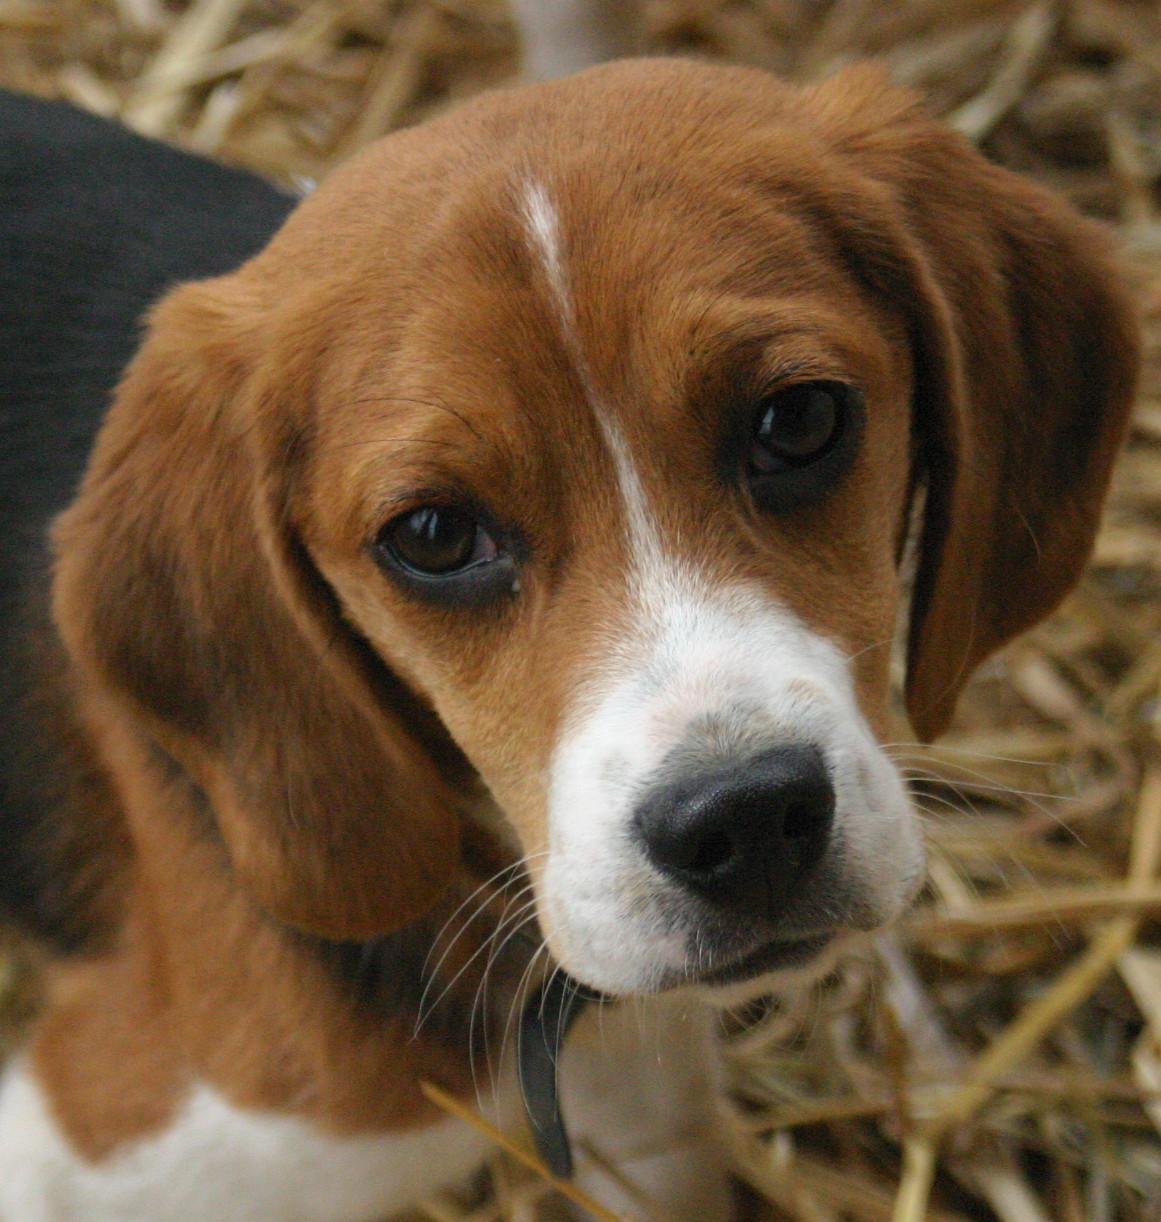 Most Inspiring Two Beagle Adorable Dog - 001_Beagle1  Trends_611568  .jpg